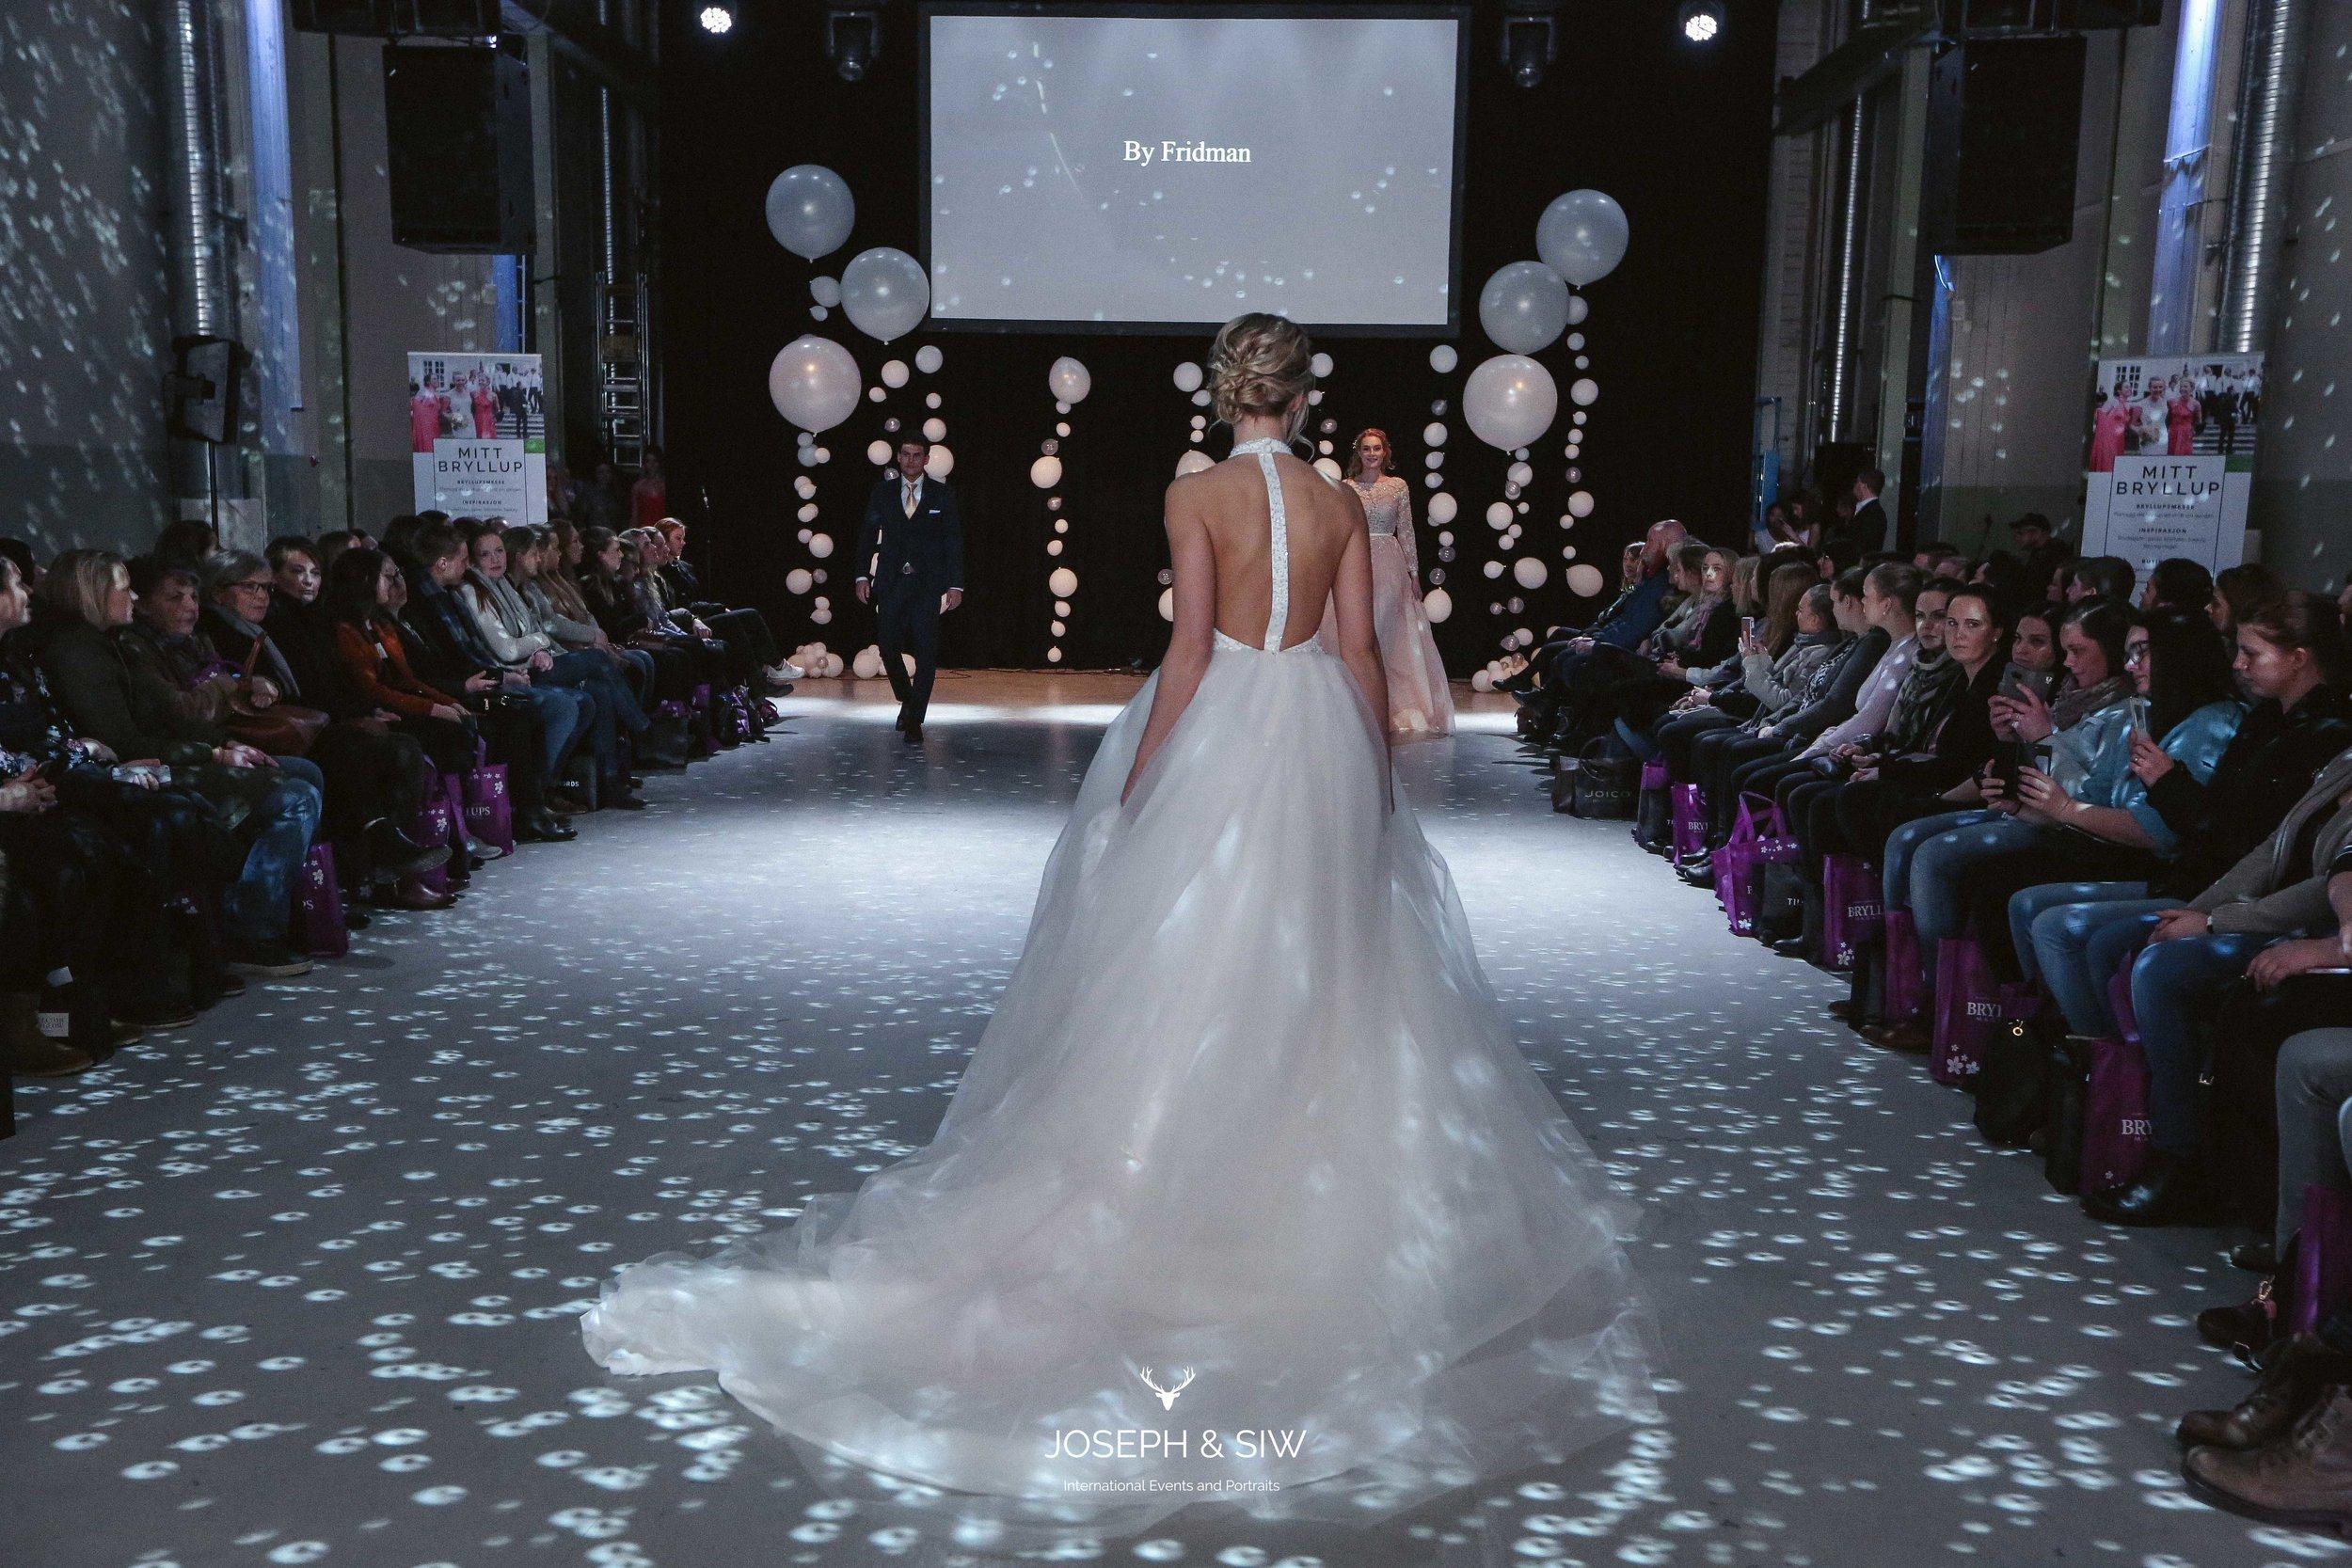 mittbryllup_bryllupsmesse_i_oslo_125.jpg